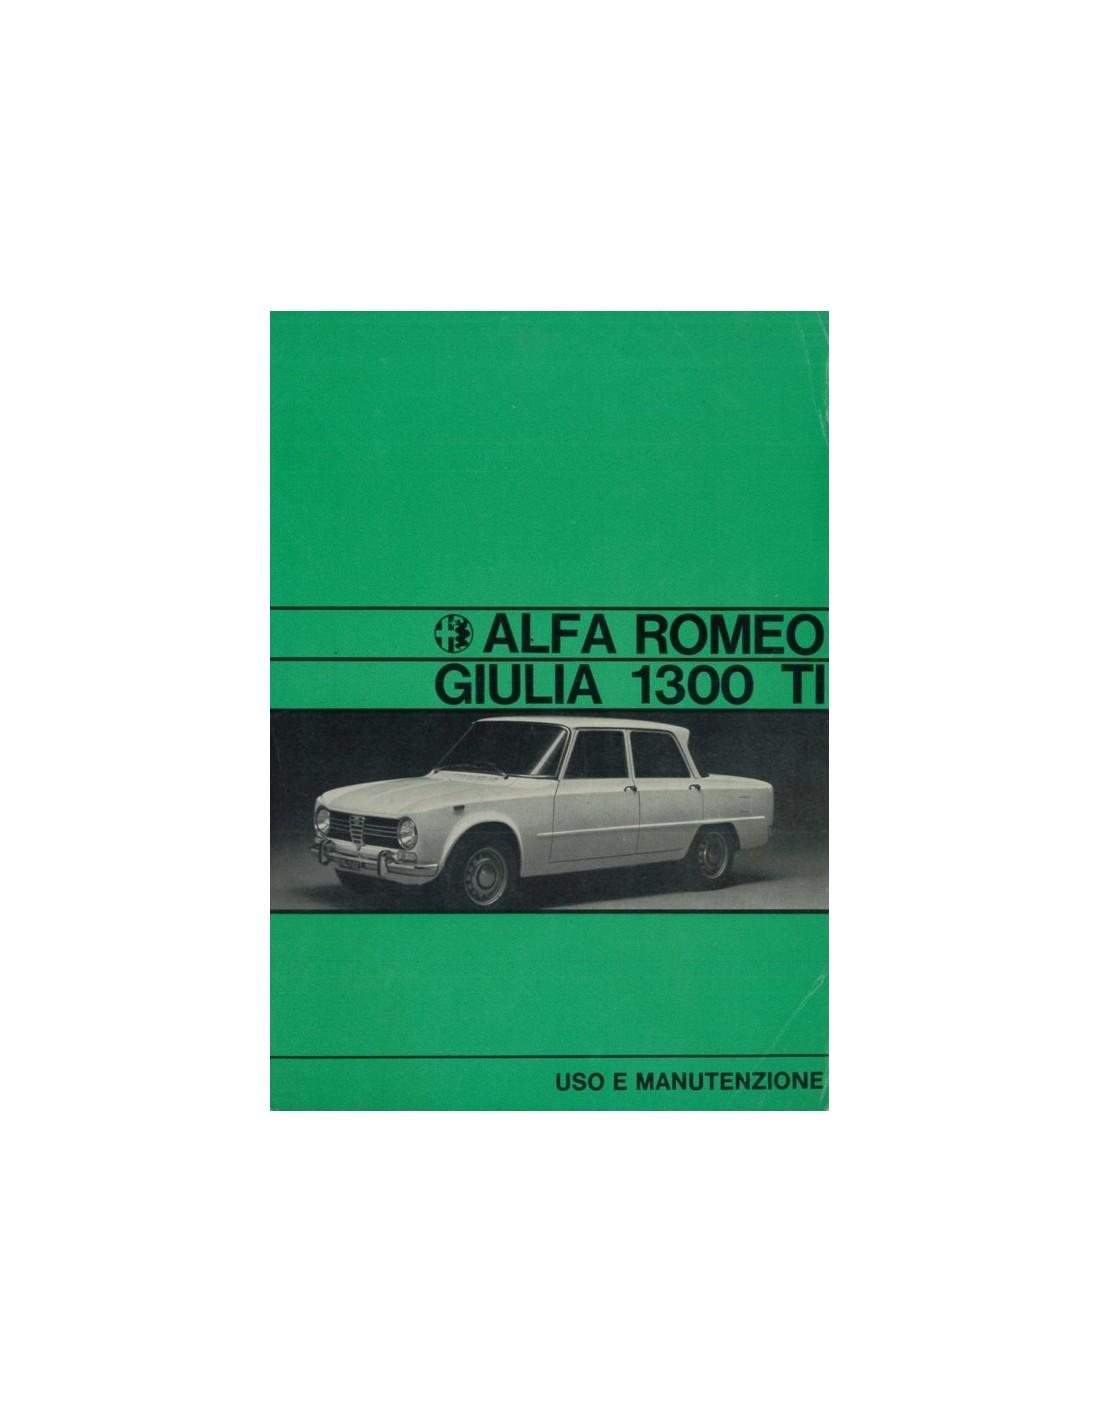 1970 ALFA ROMEO GIULIA 1300 TI OWNER'S MANUAL ITALIAN